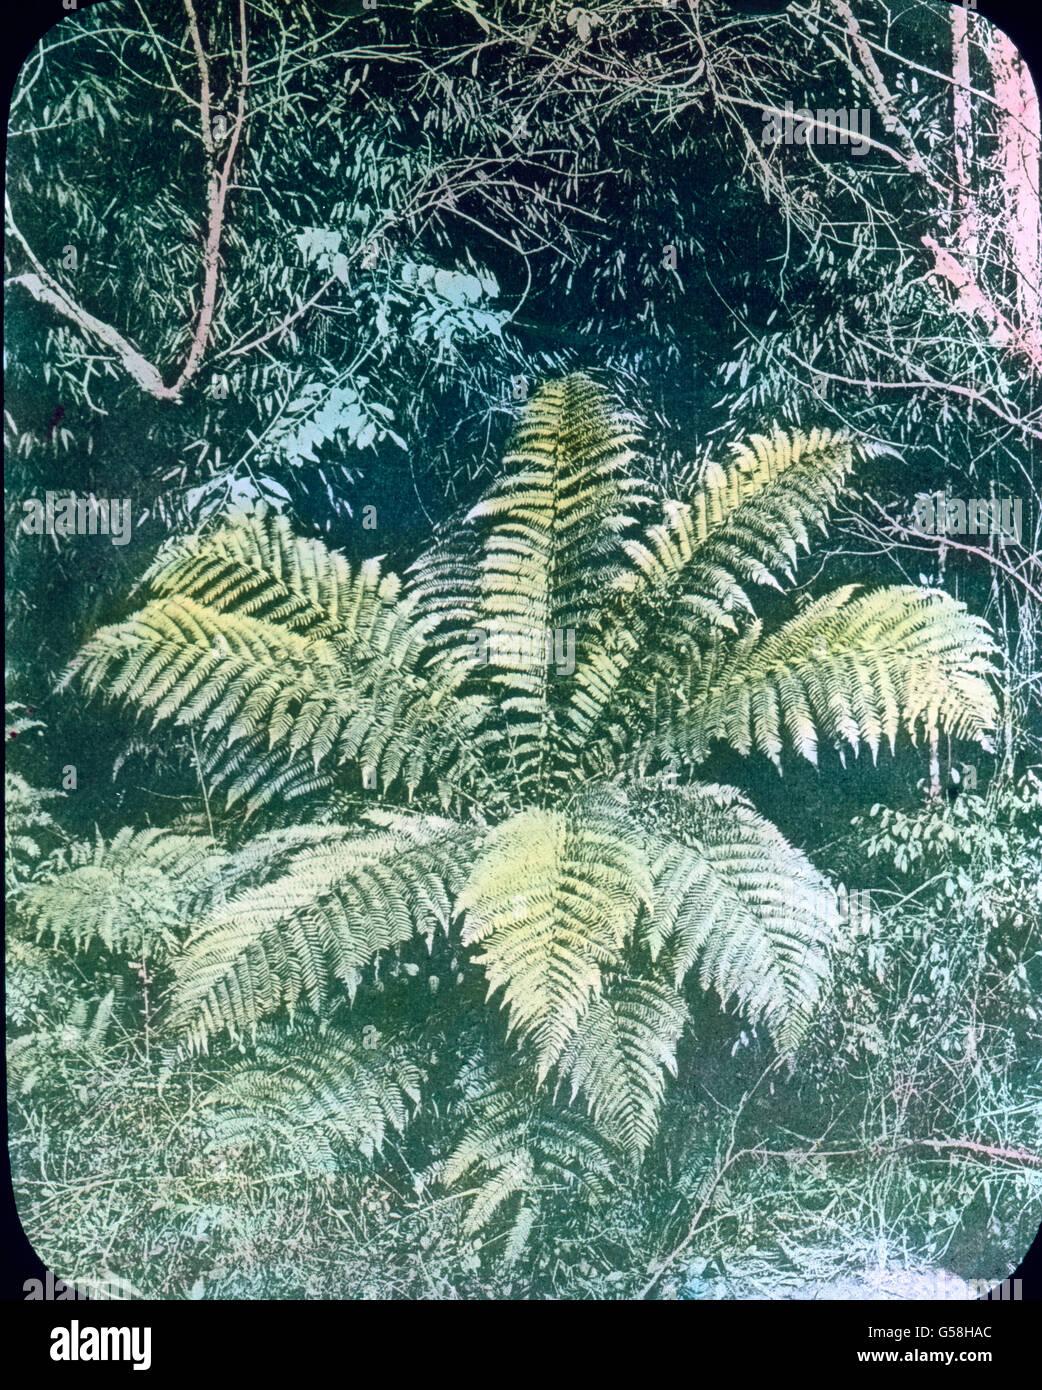 Riesenfarn in der Pflanzenwelt des Dschungels. India, Asia, travel, botany, jungle, plant, brake, fern, 1910s, 20th - Stock Image